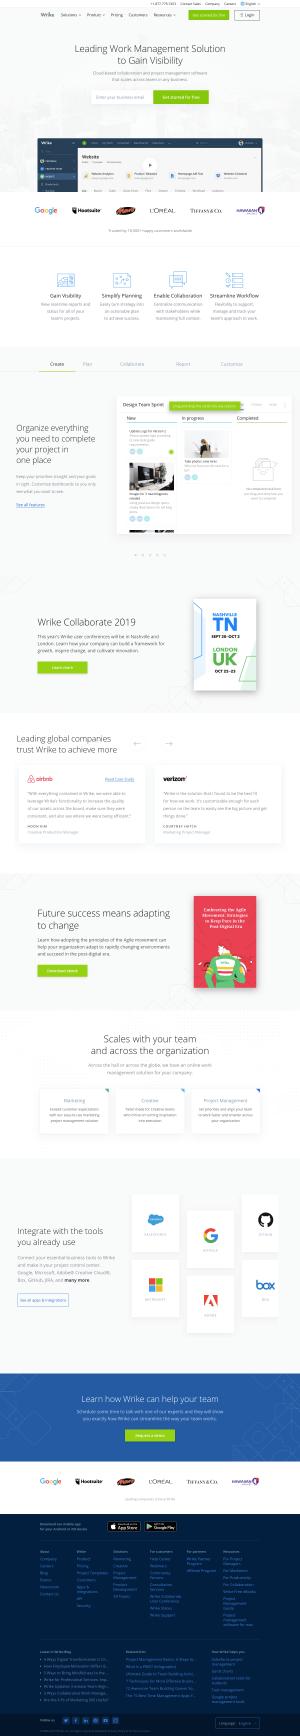 Wrike - Homepage